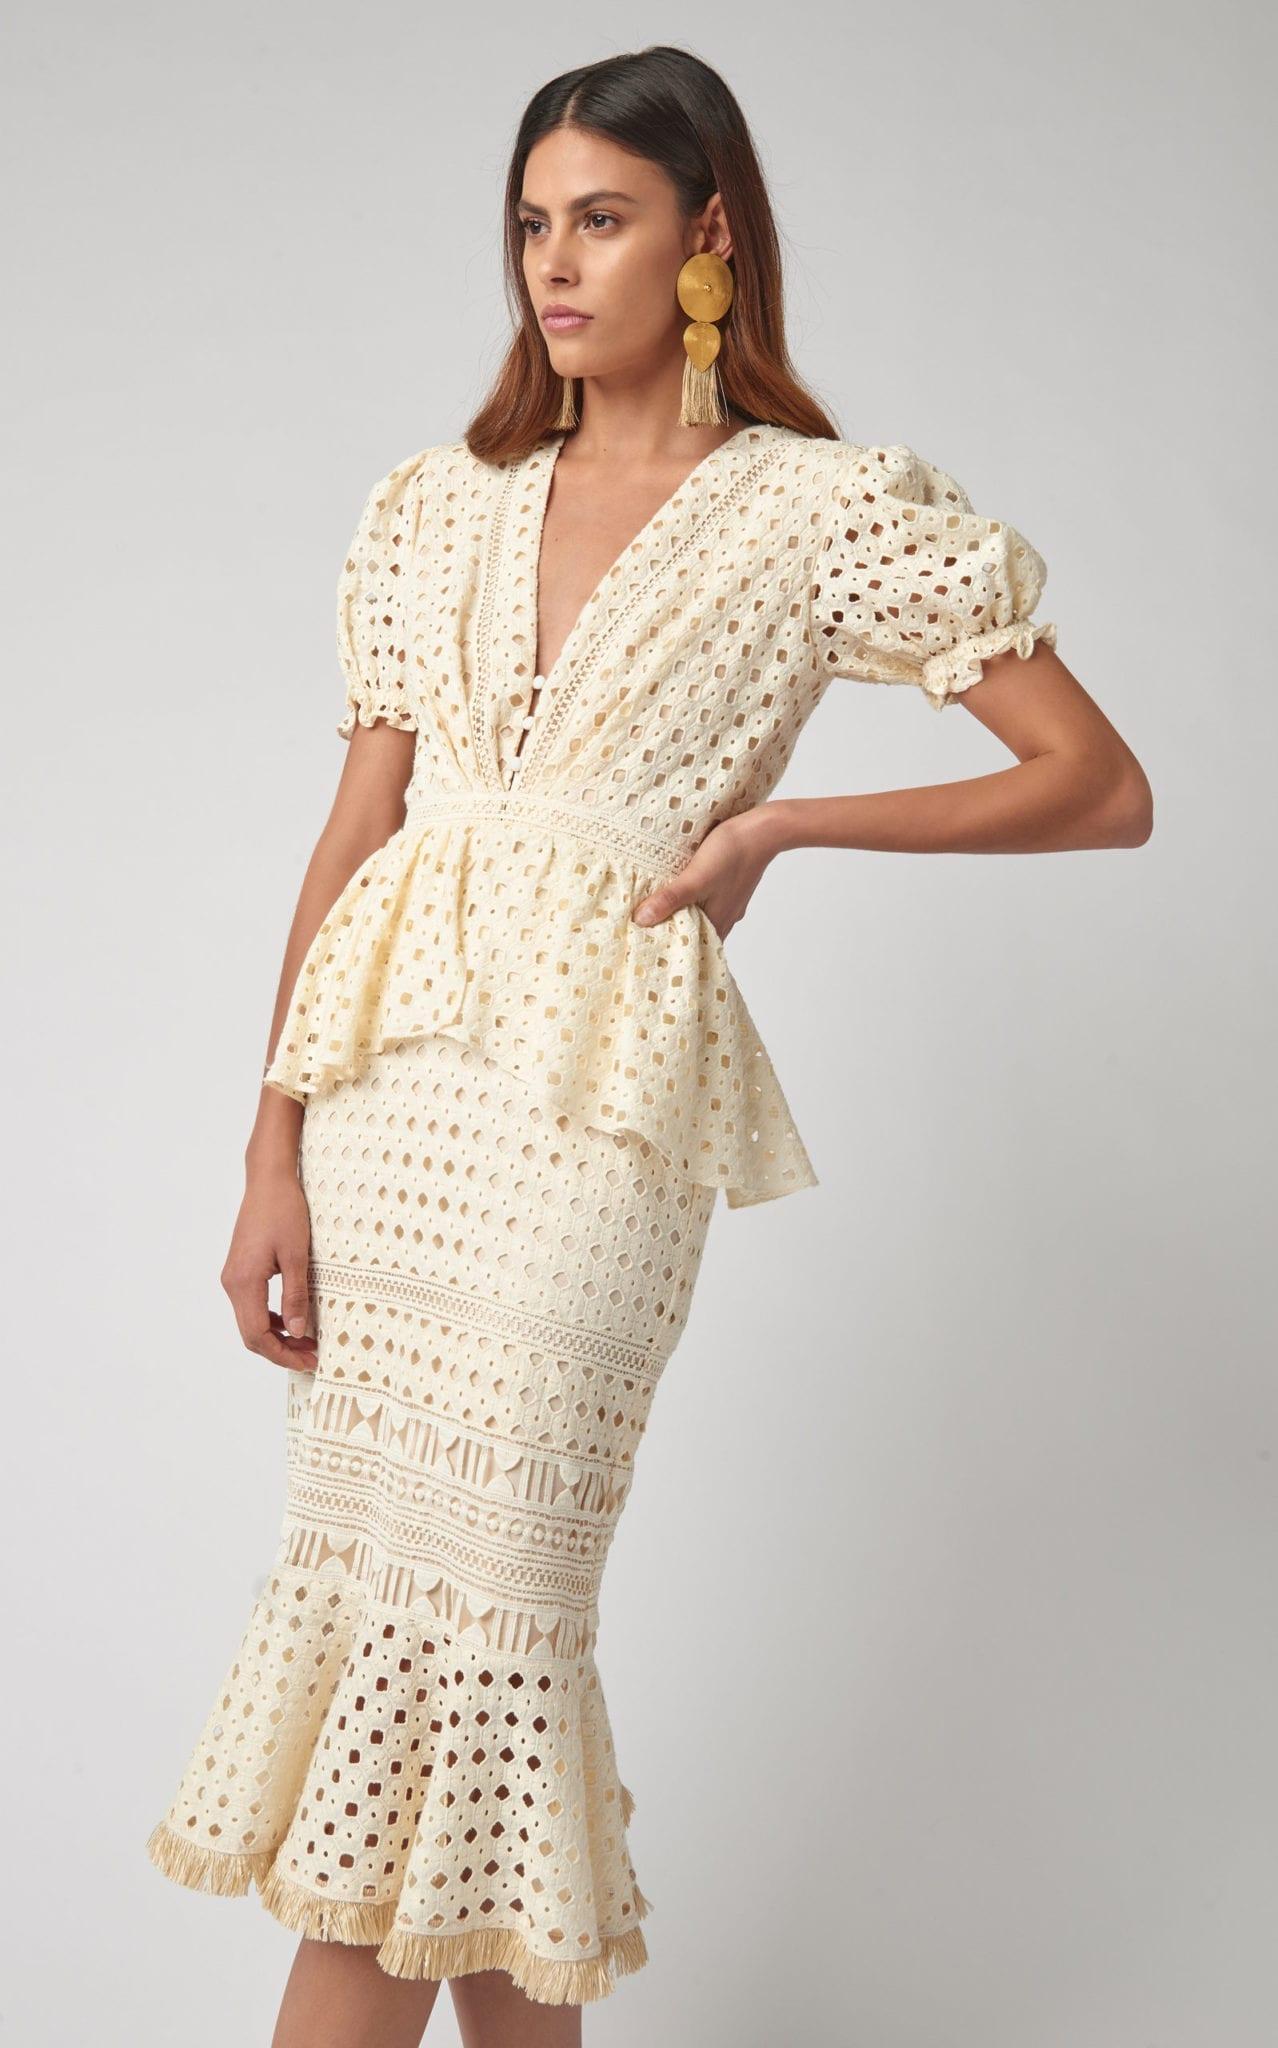 JOHANNA ORTIZ Lovers Bridgelush Broderie Anglaise Cotton Peplum White Dress